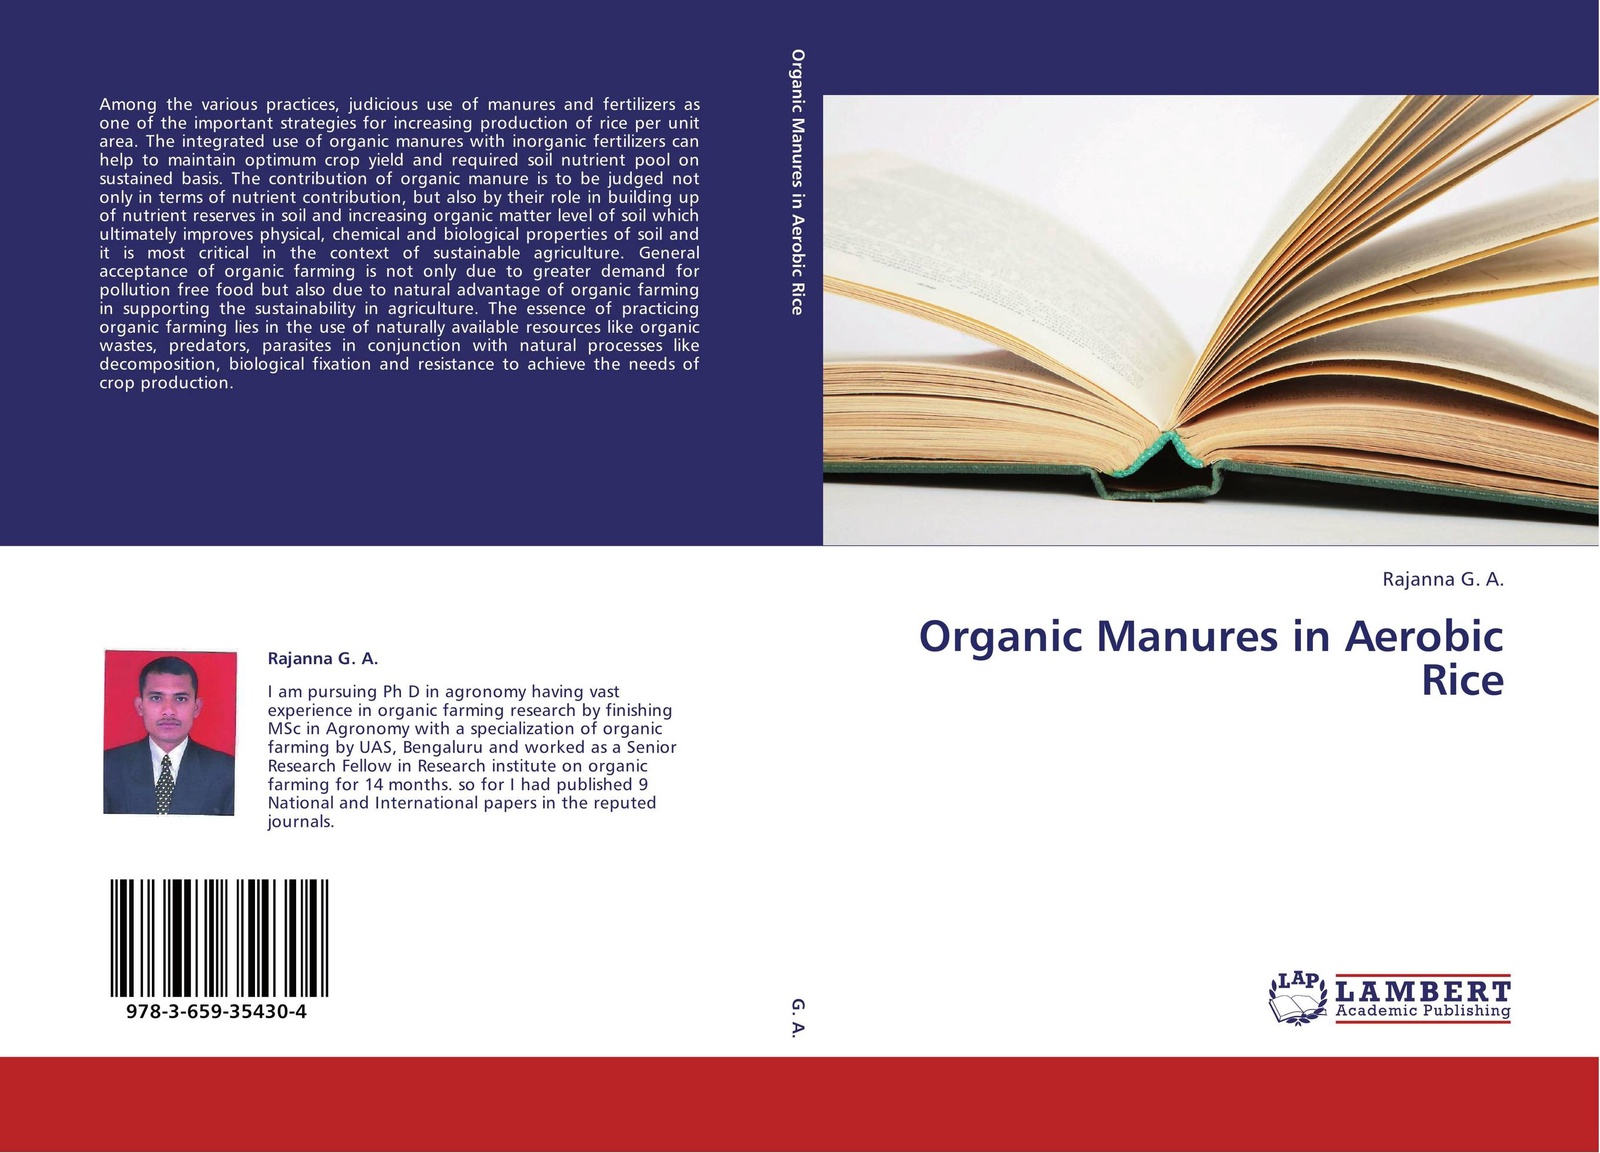 Rajanna G. A. Organic Manures in Aerobic Rice цены